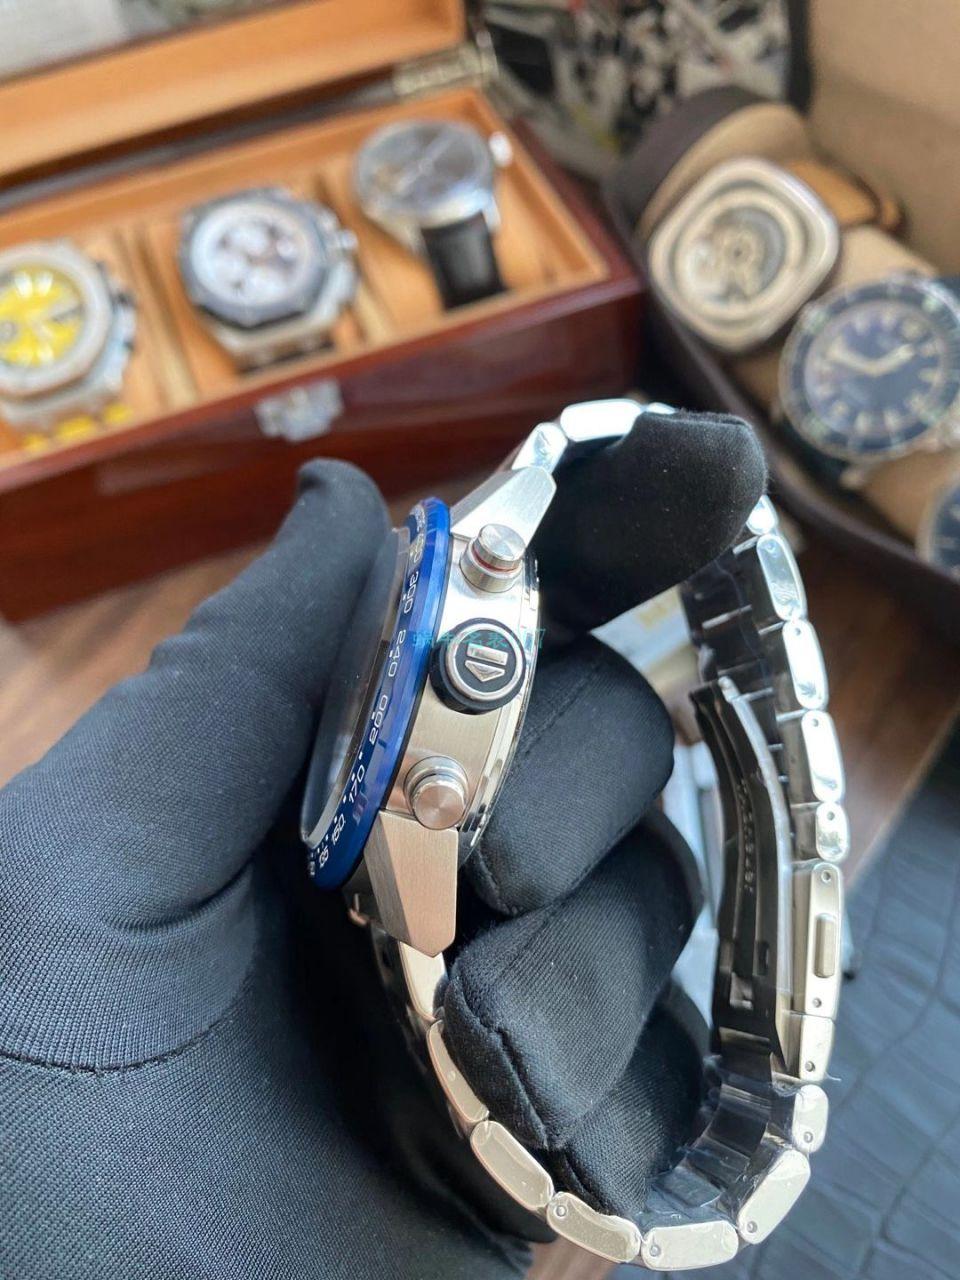 XF厂泰格豪雅卡莱拉一比一高仿手表CAR201T.BA0766腕表 / TG111